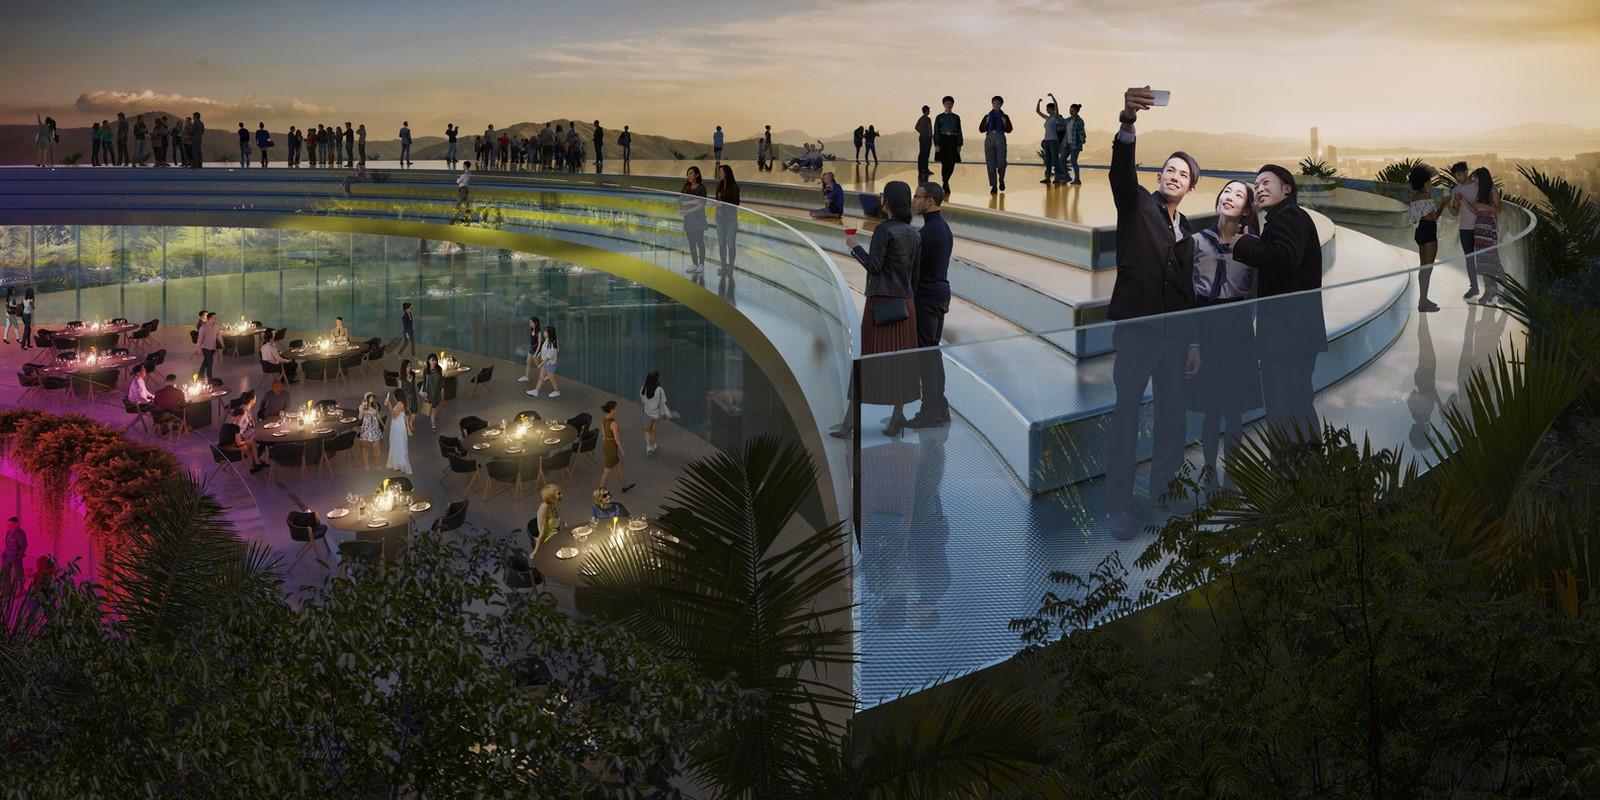 """World's First Farmscraper"" Featuring Vertical Hydroponic Farm designed by Carlo Ratti Associati - Sheet3"